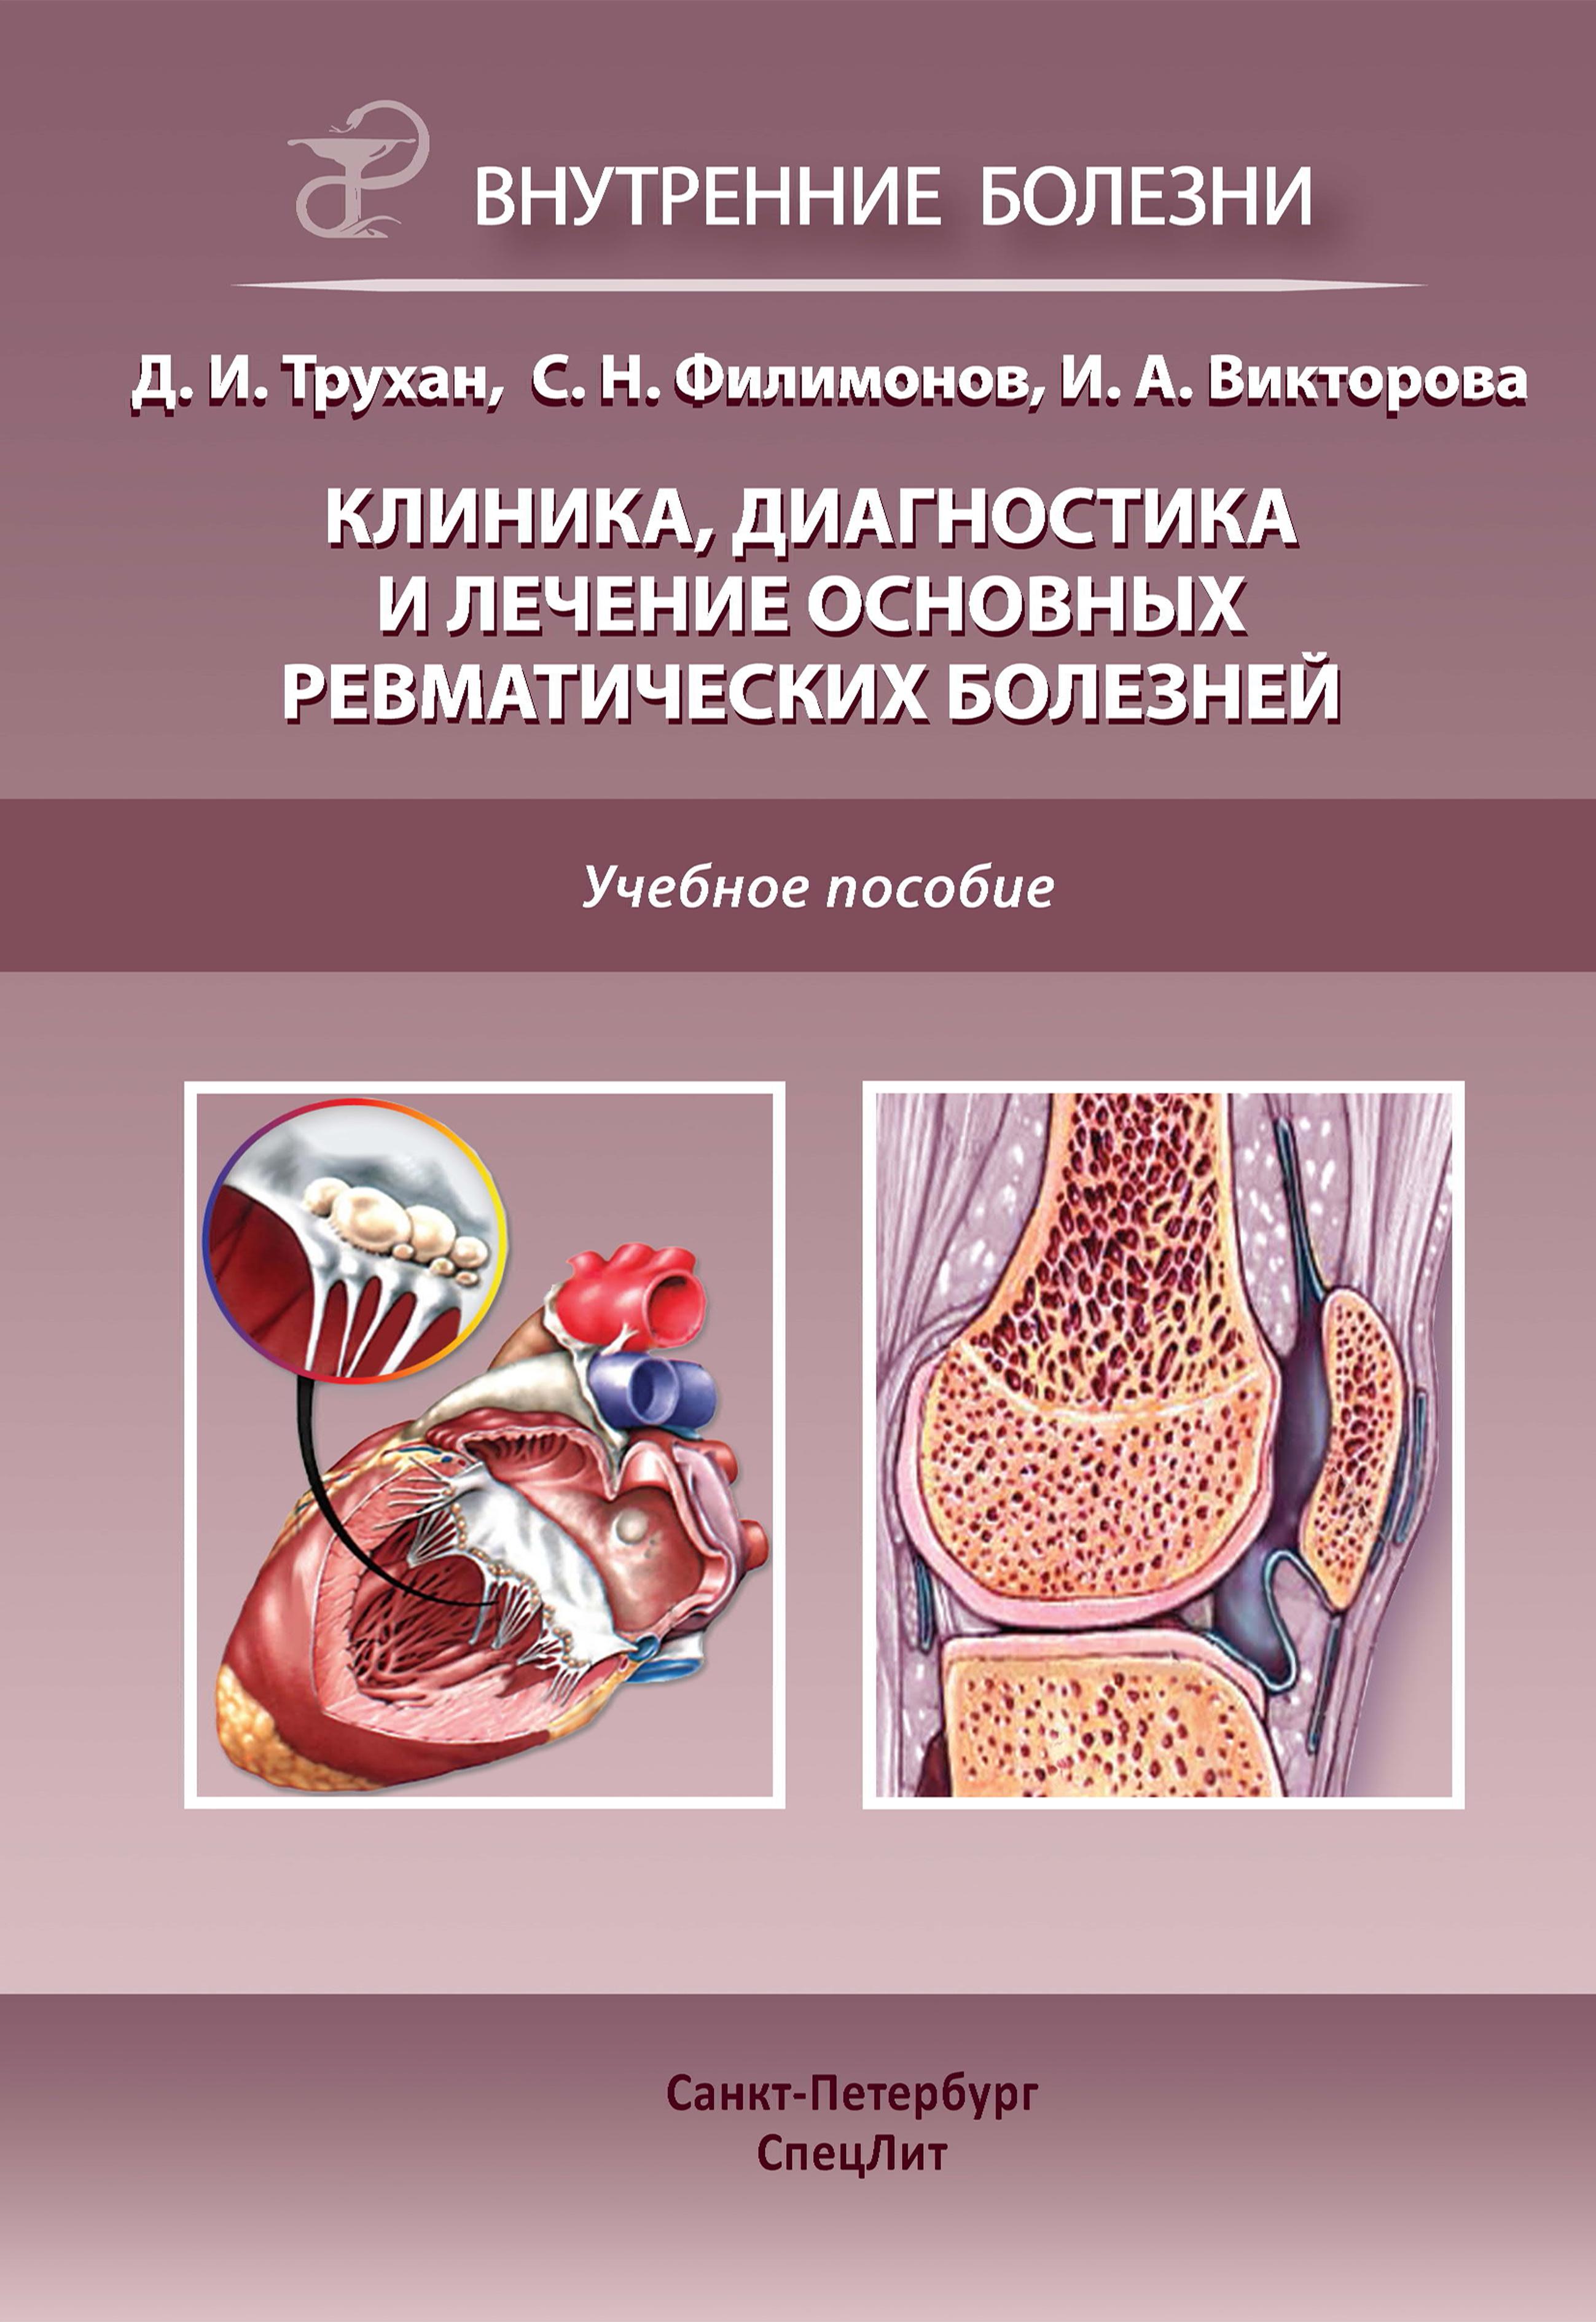 Ревматические болезни